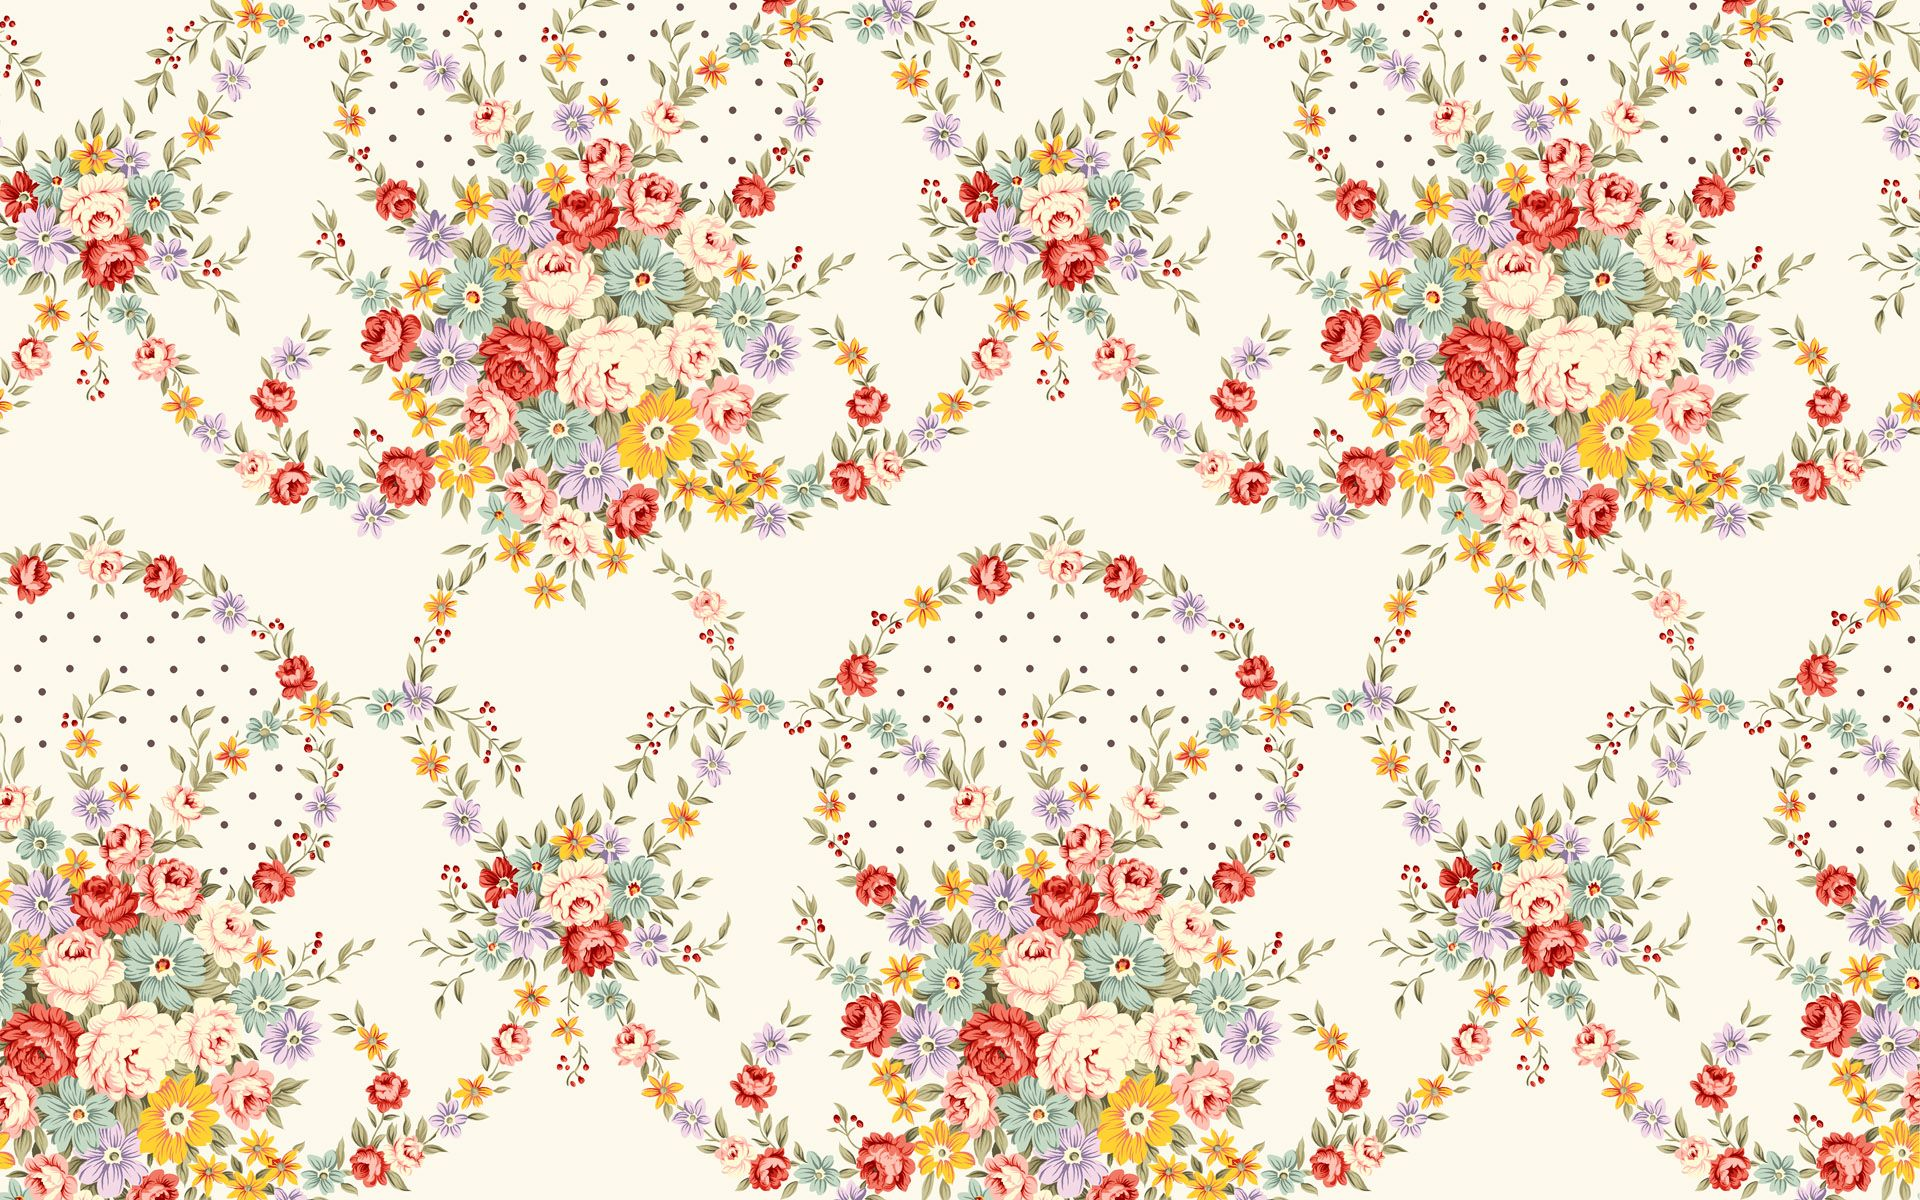 Background Tumblr Wallpaper Flower Free Download